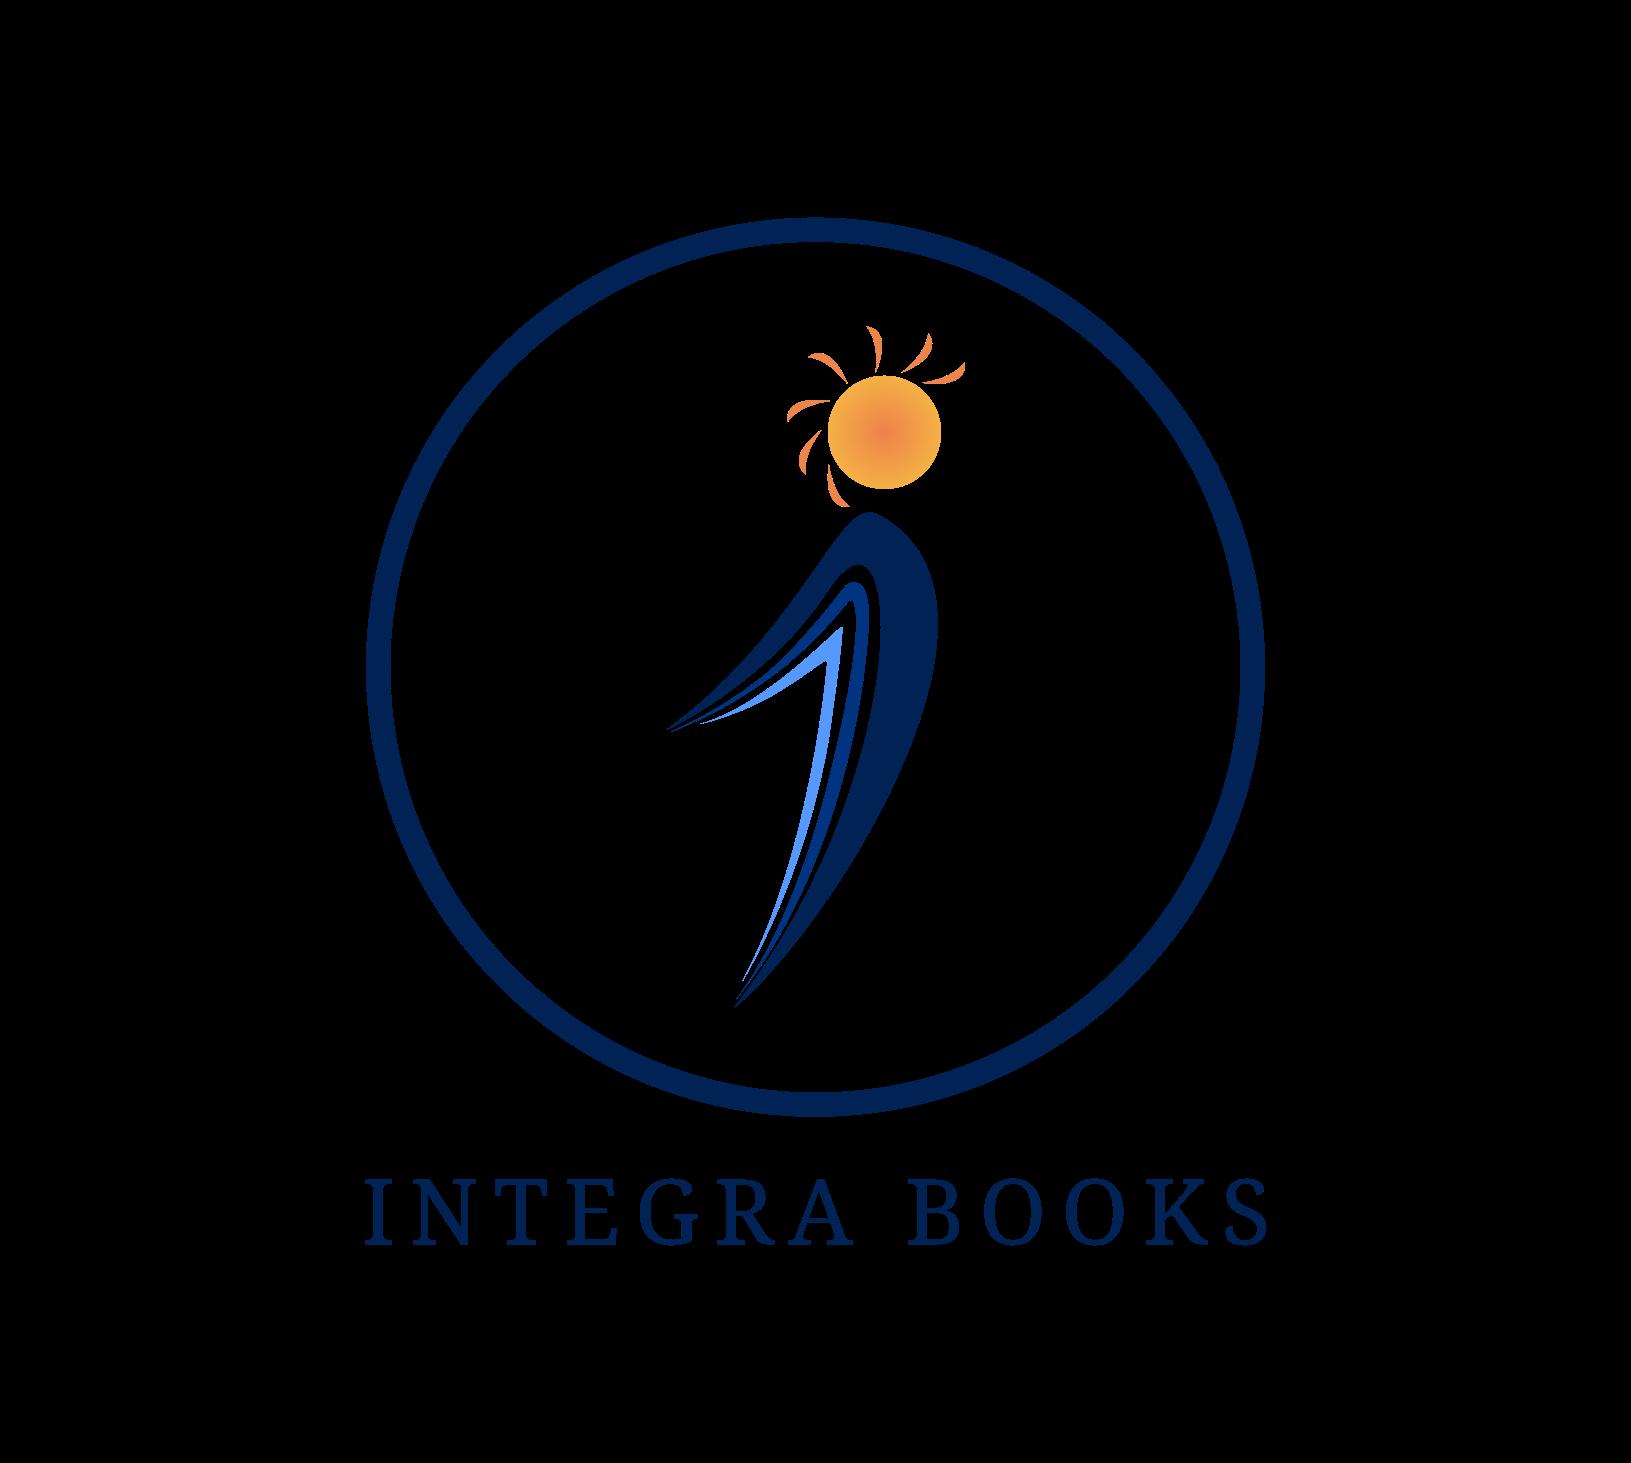 Integra Books